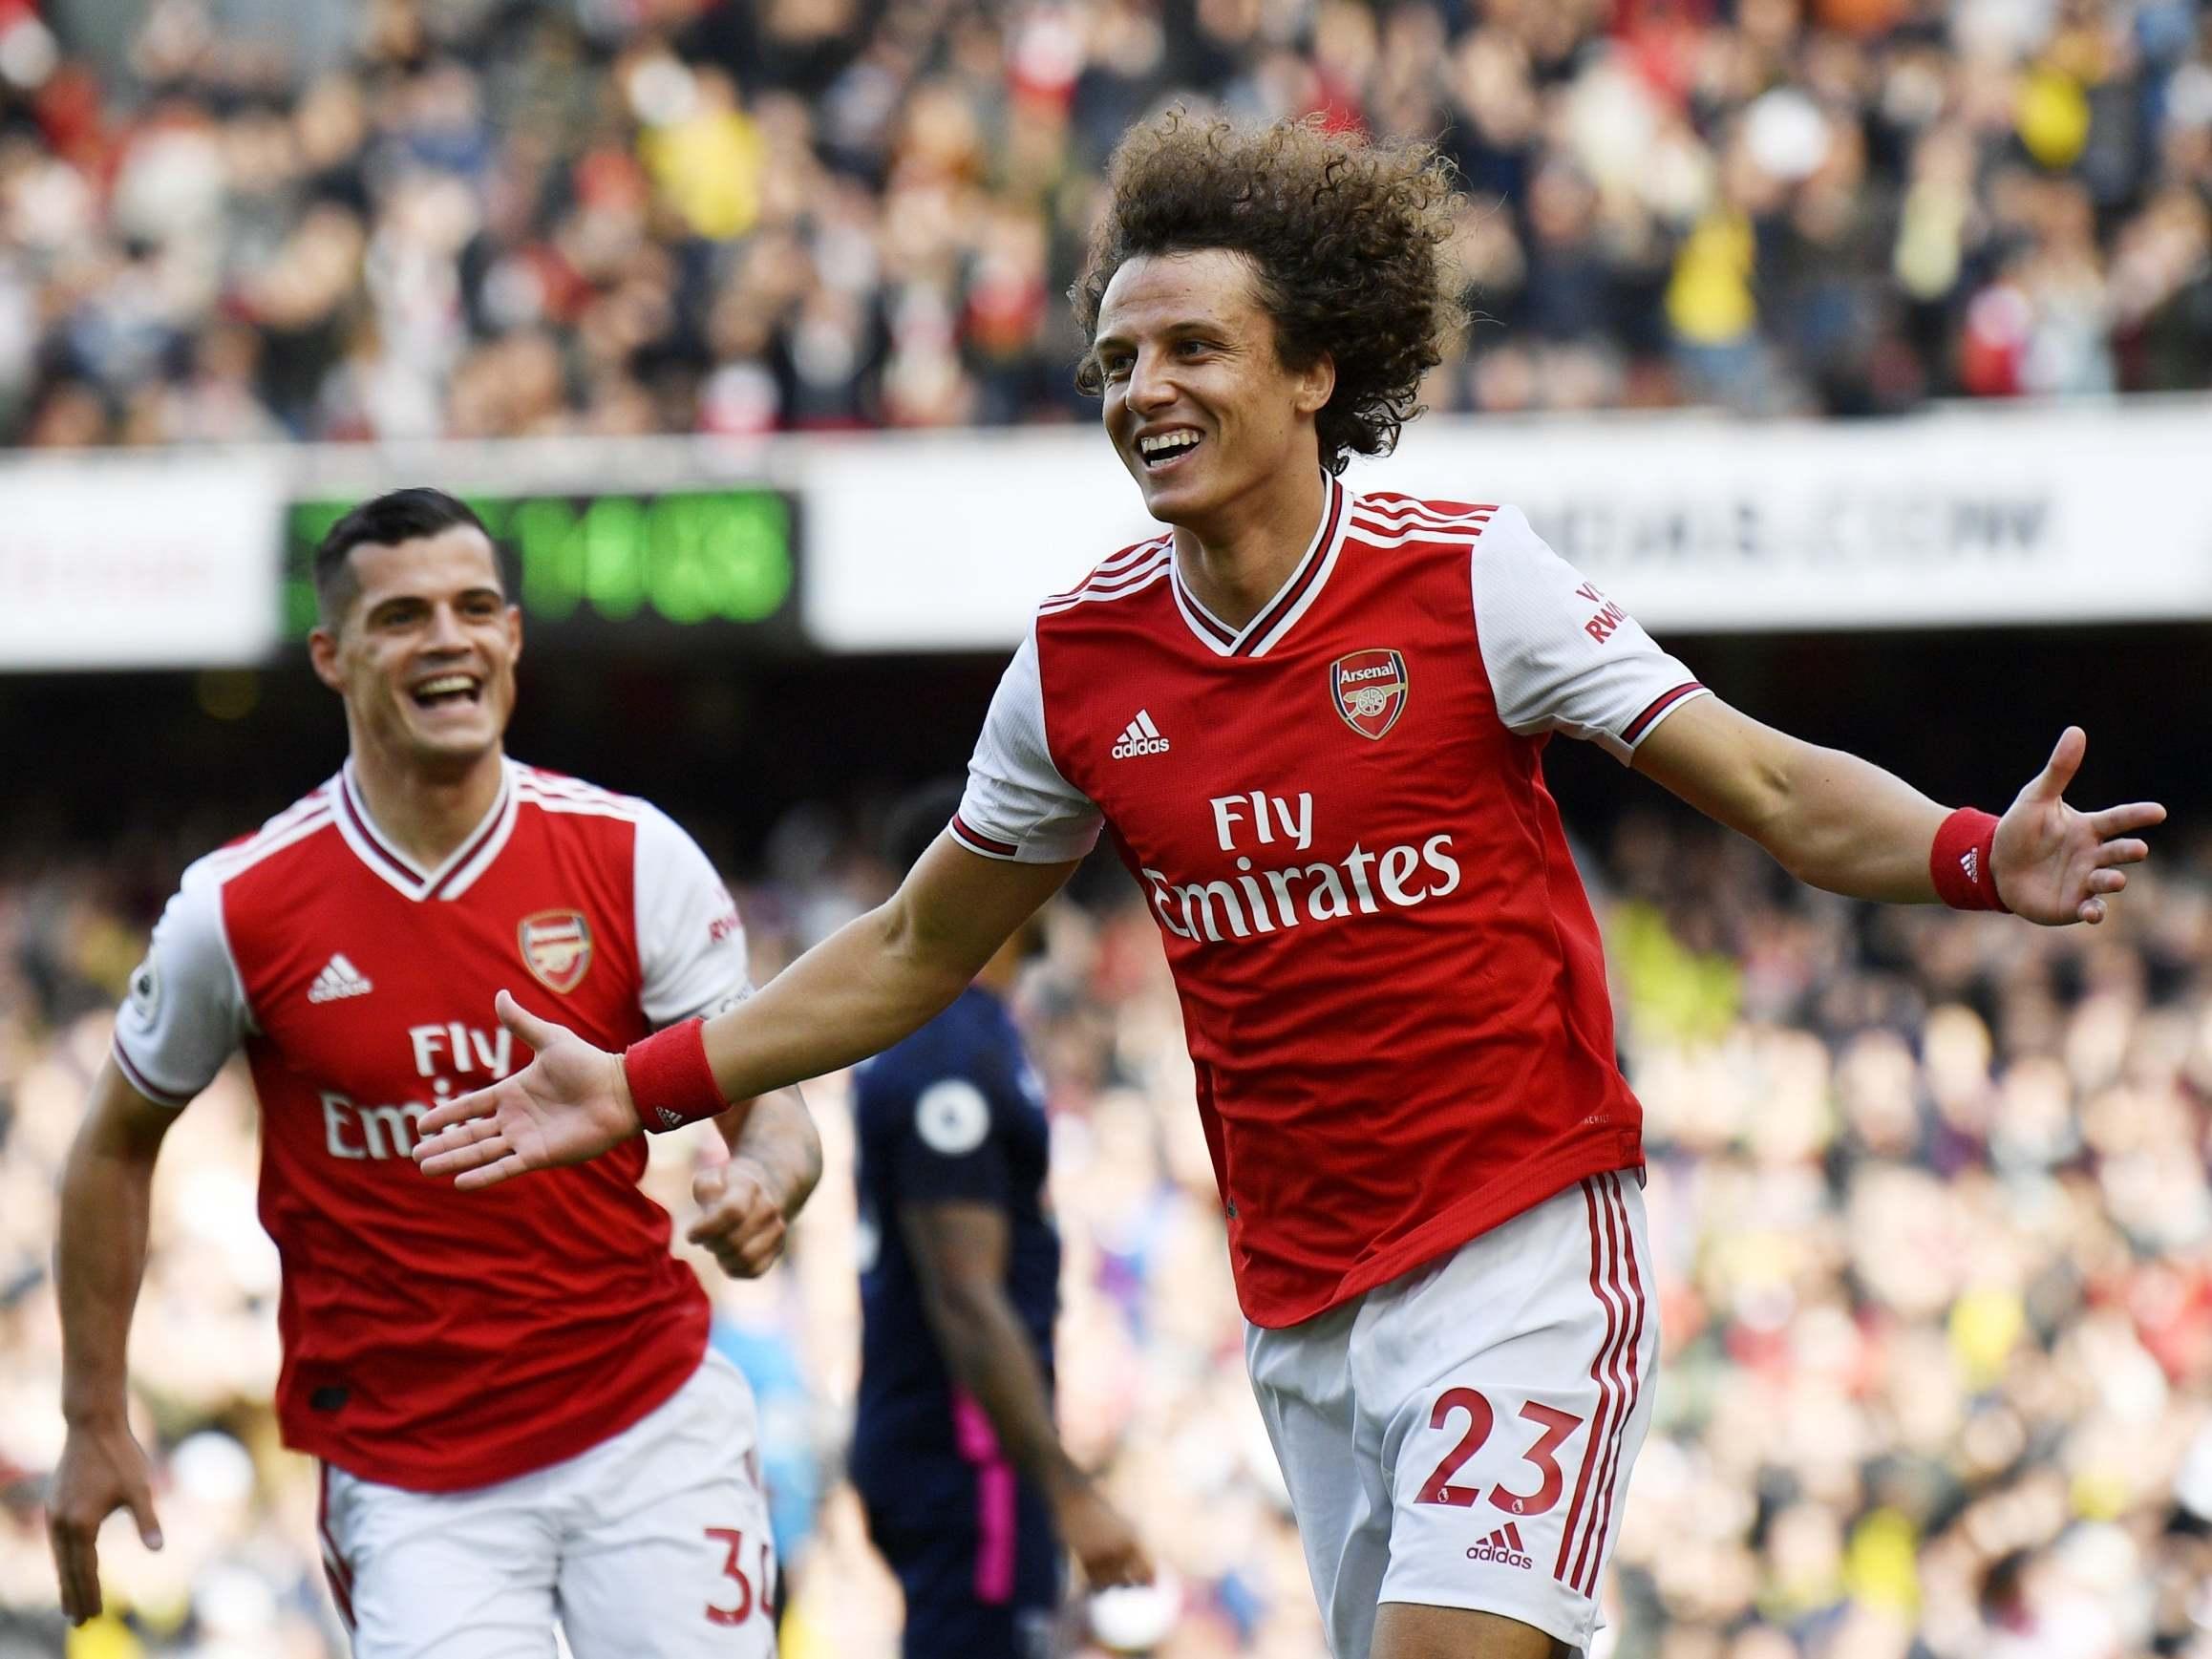 Arsenal news: David Luiz says Gunners can win the Premier League title